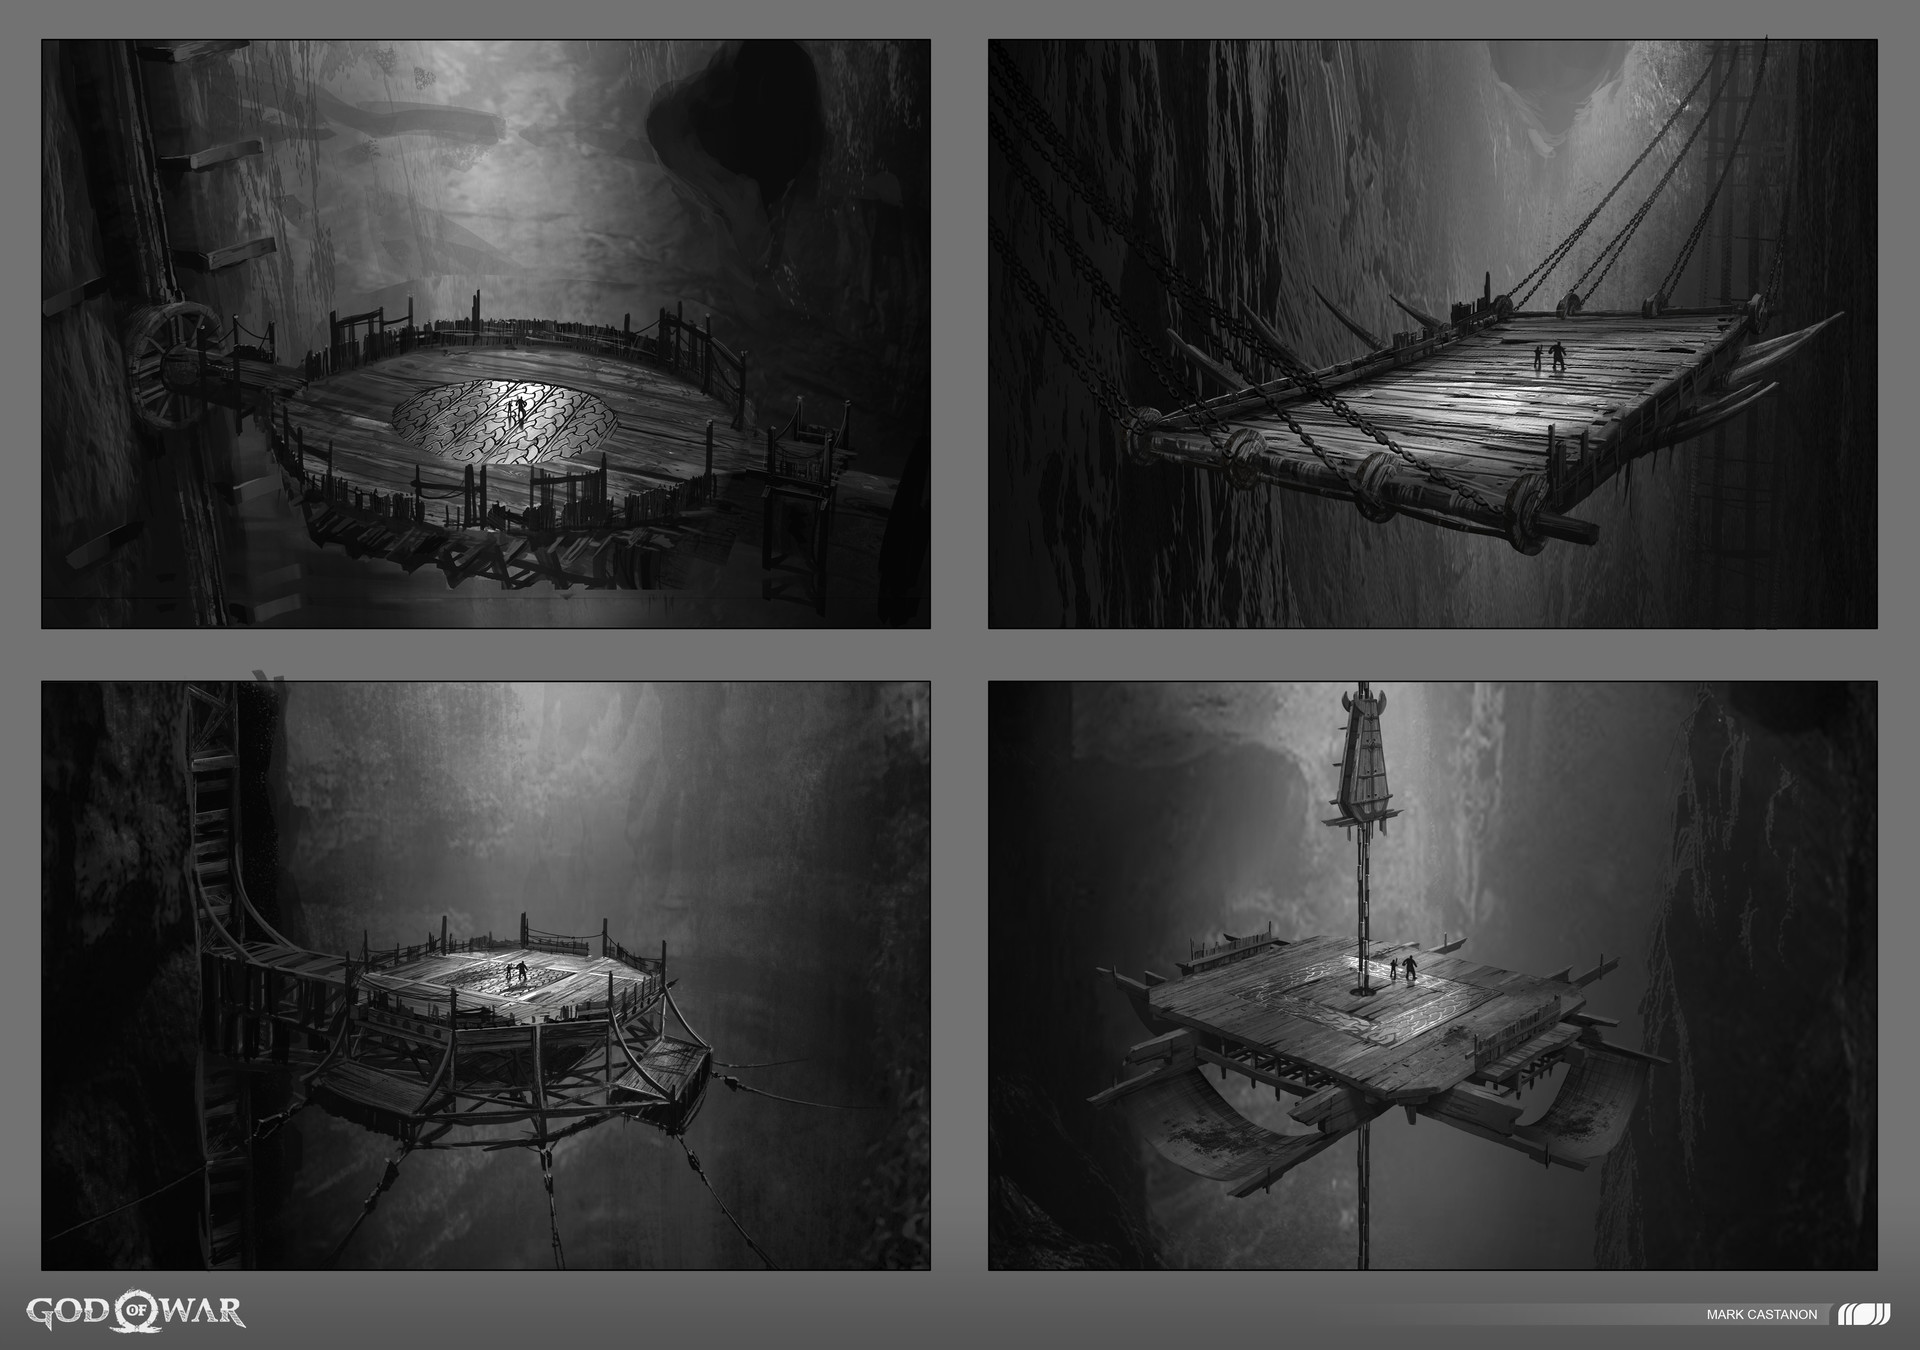 mark-castanon-pp-elevatorplatform-sketches-mc-02-001.jpg